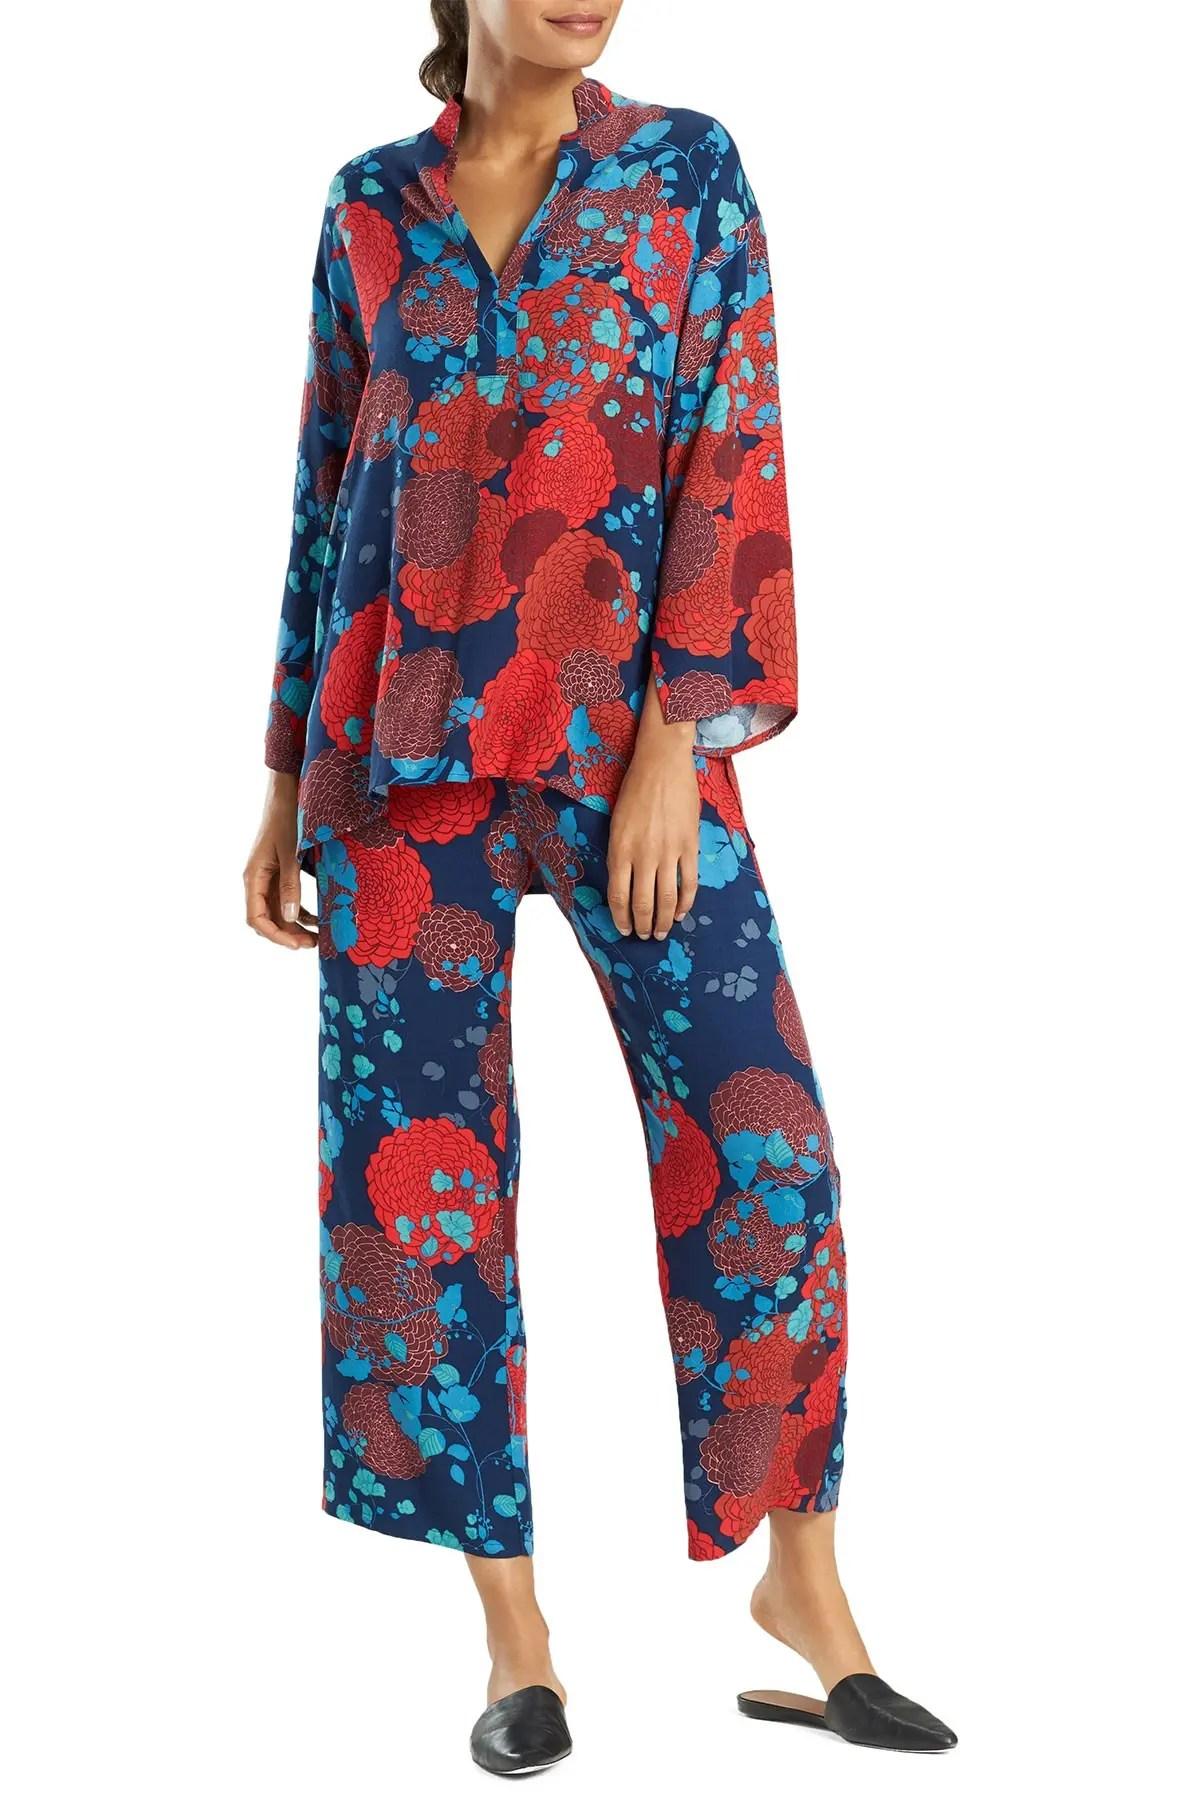 n natori floral print 2 piece pajama set nordstrom rack